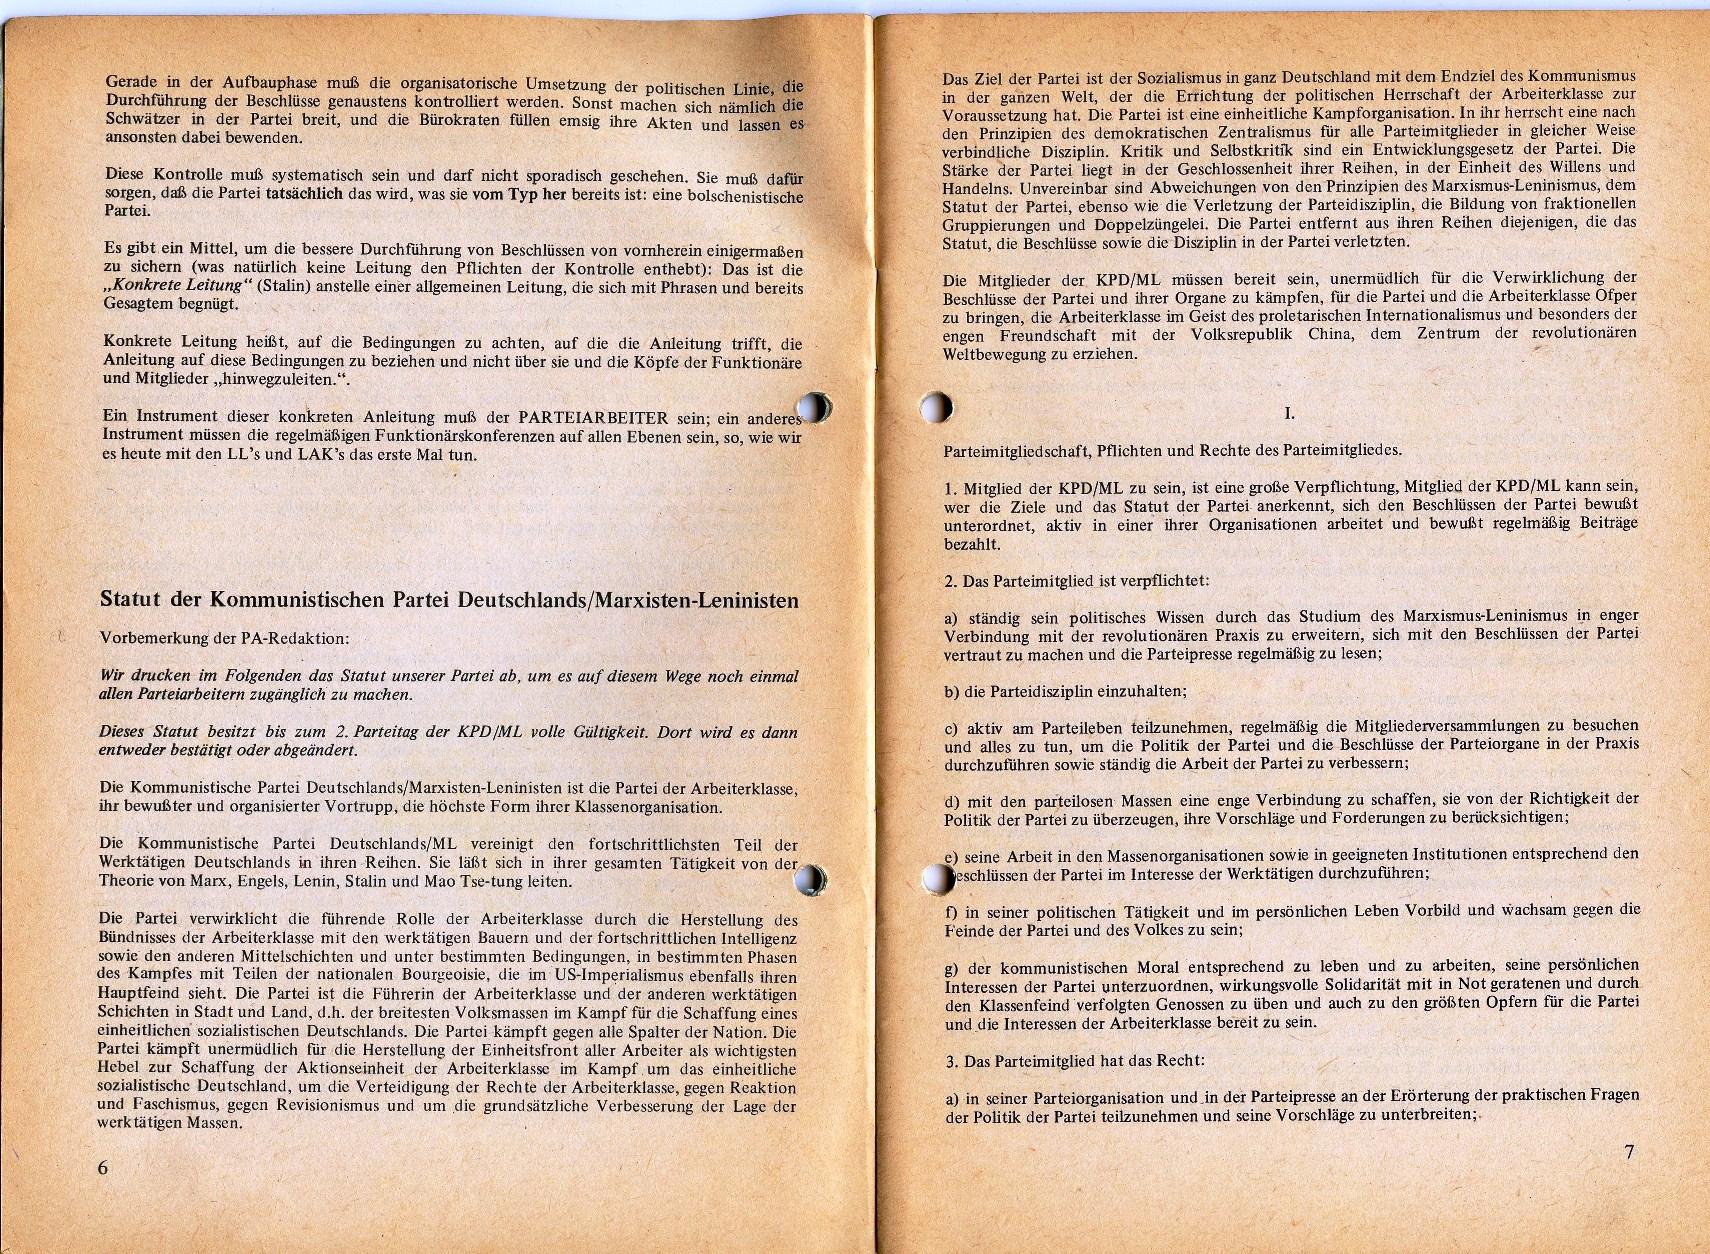 ZB_Parteiarbeiter_1970_02_05